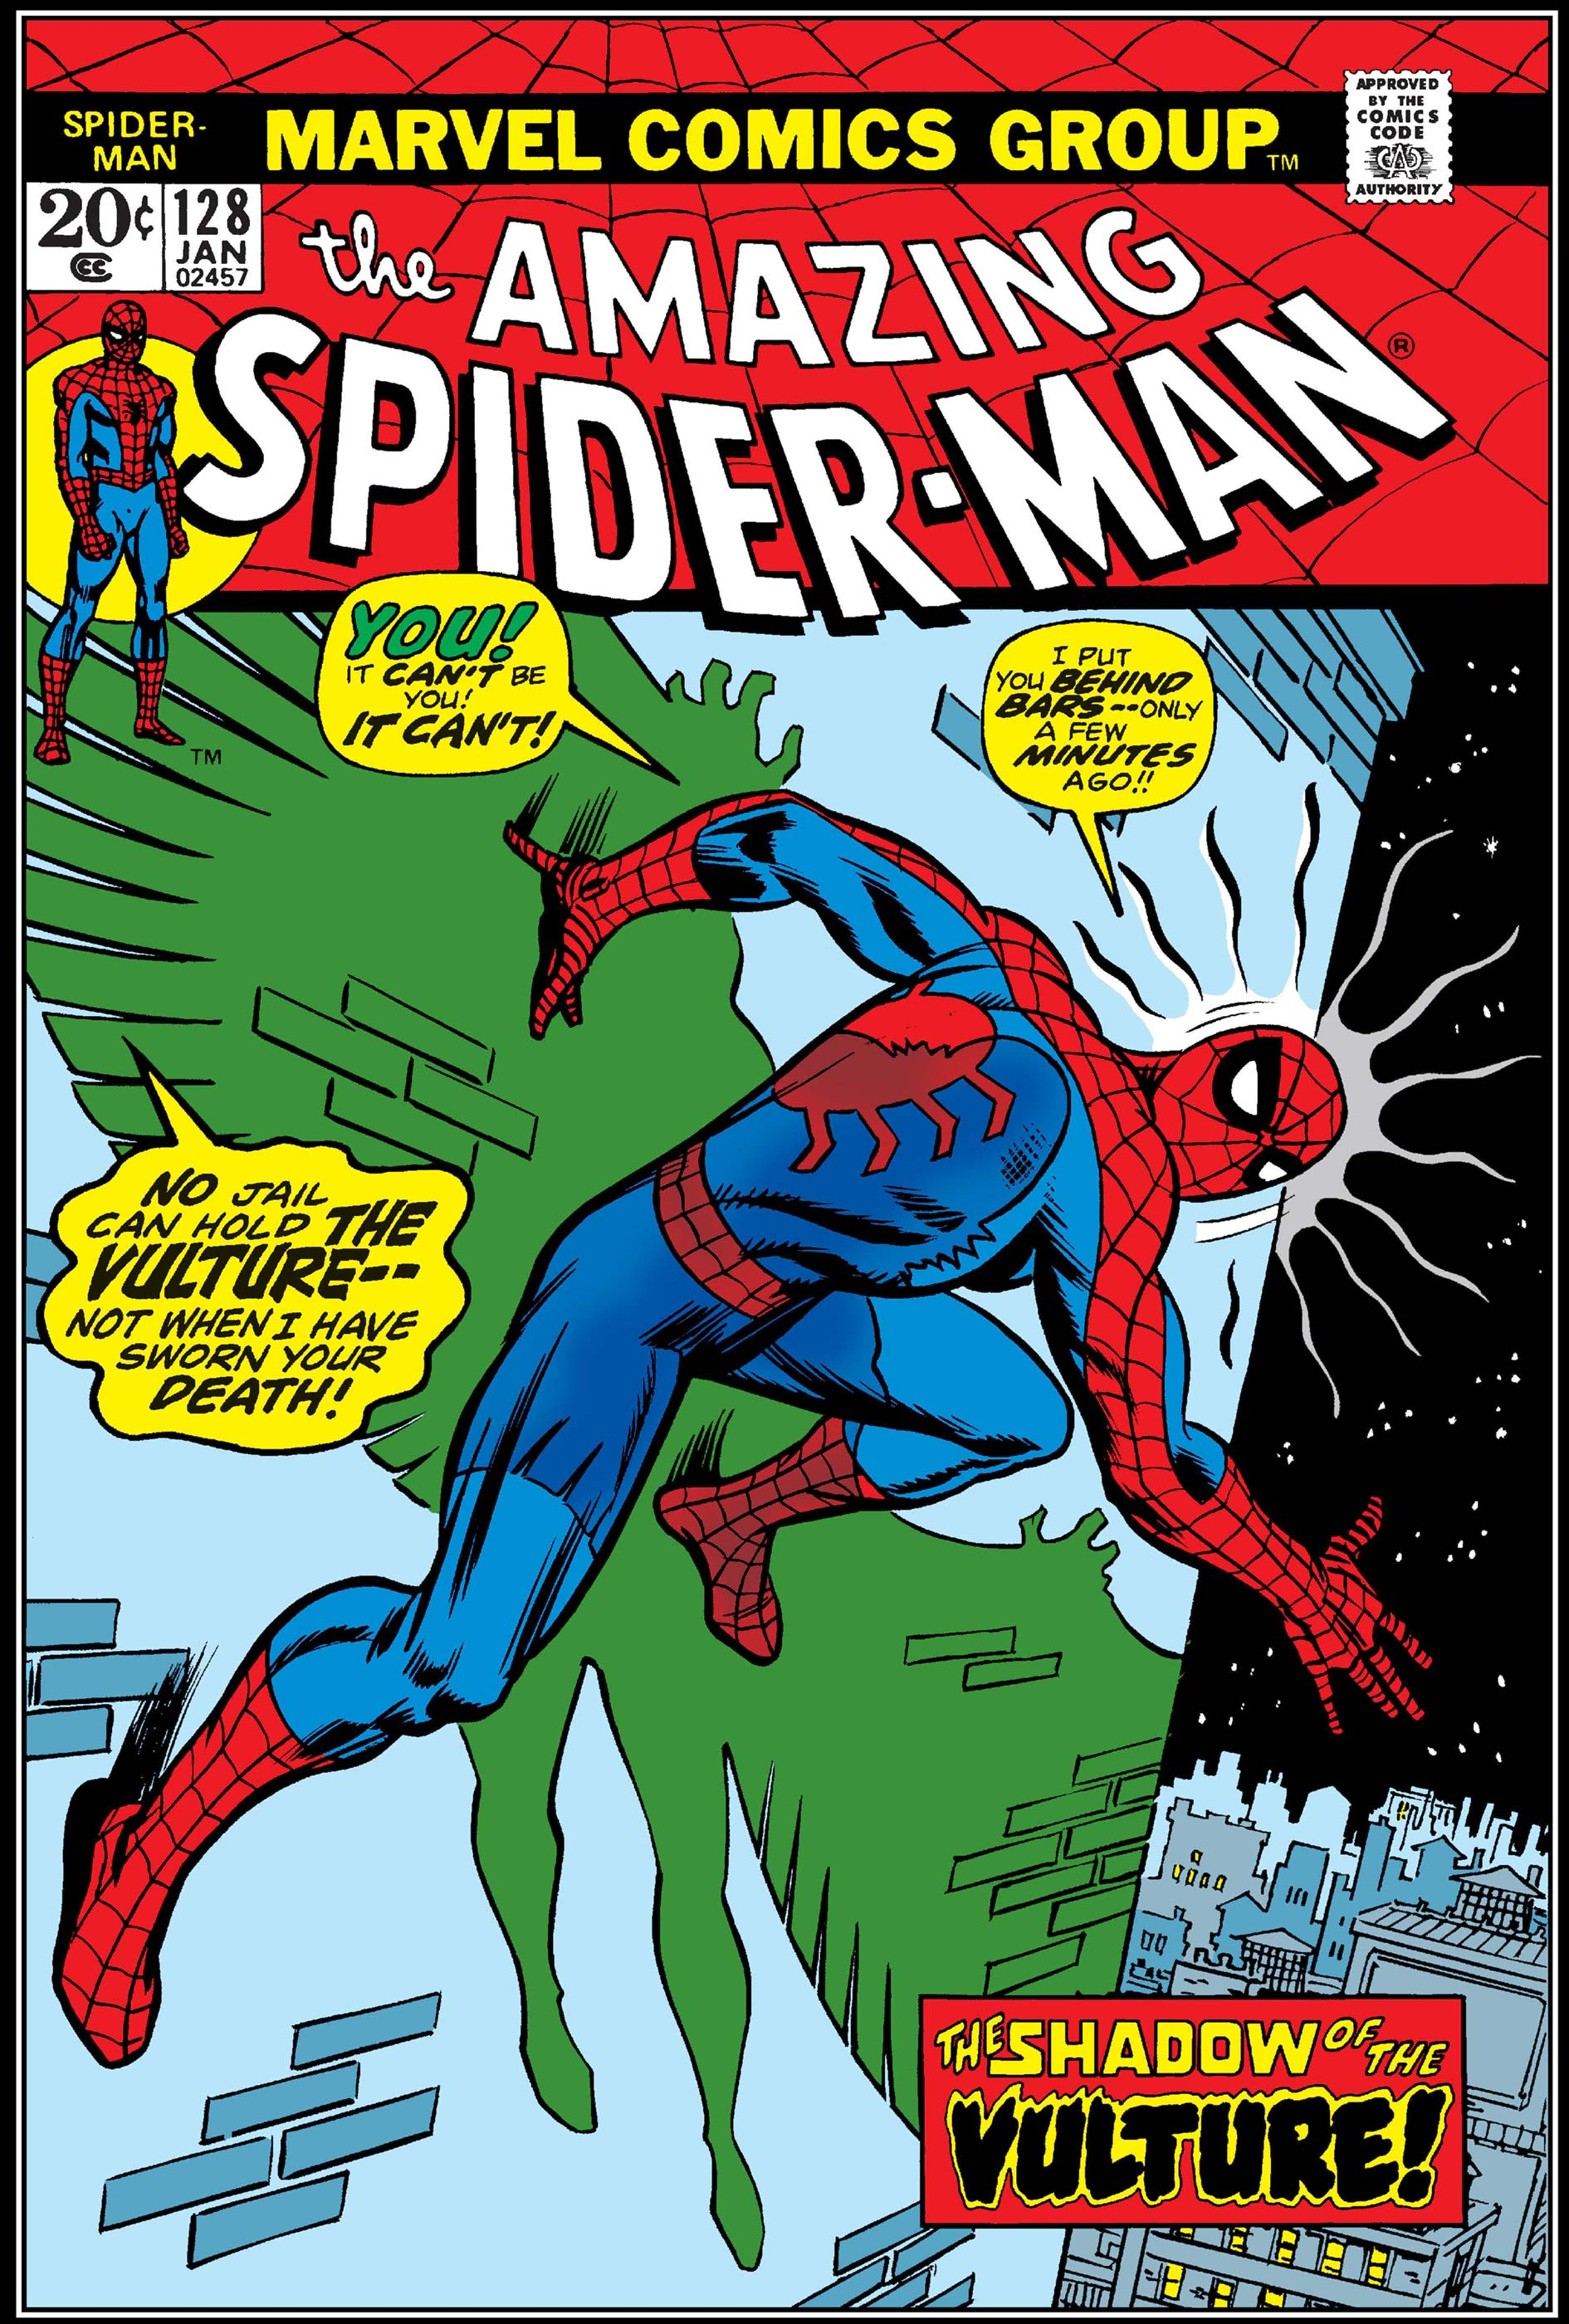 The Amazing Spider-Man (1963) #128